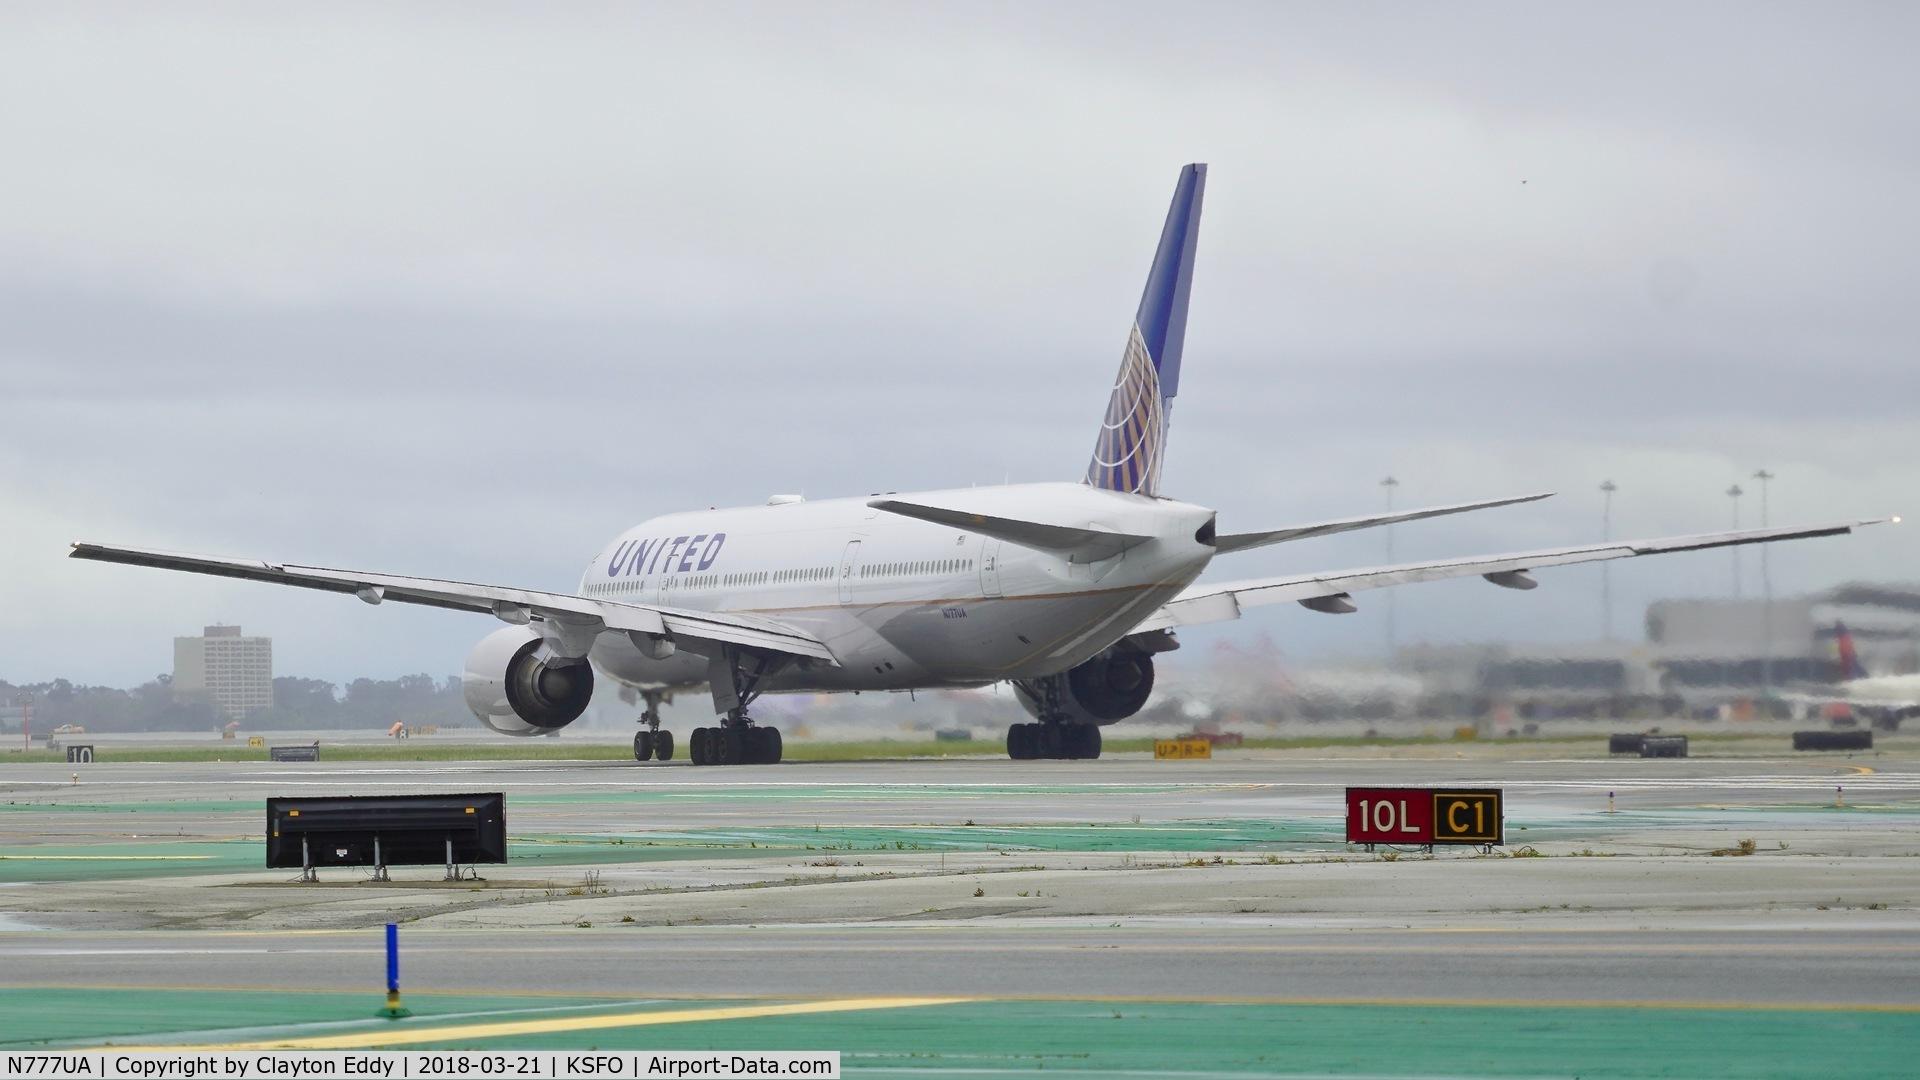 N777UA, 1995 Boeing 777-222 C/N 26916, SFO 2018.